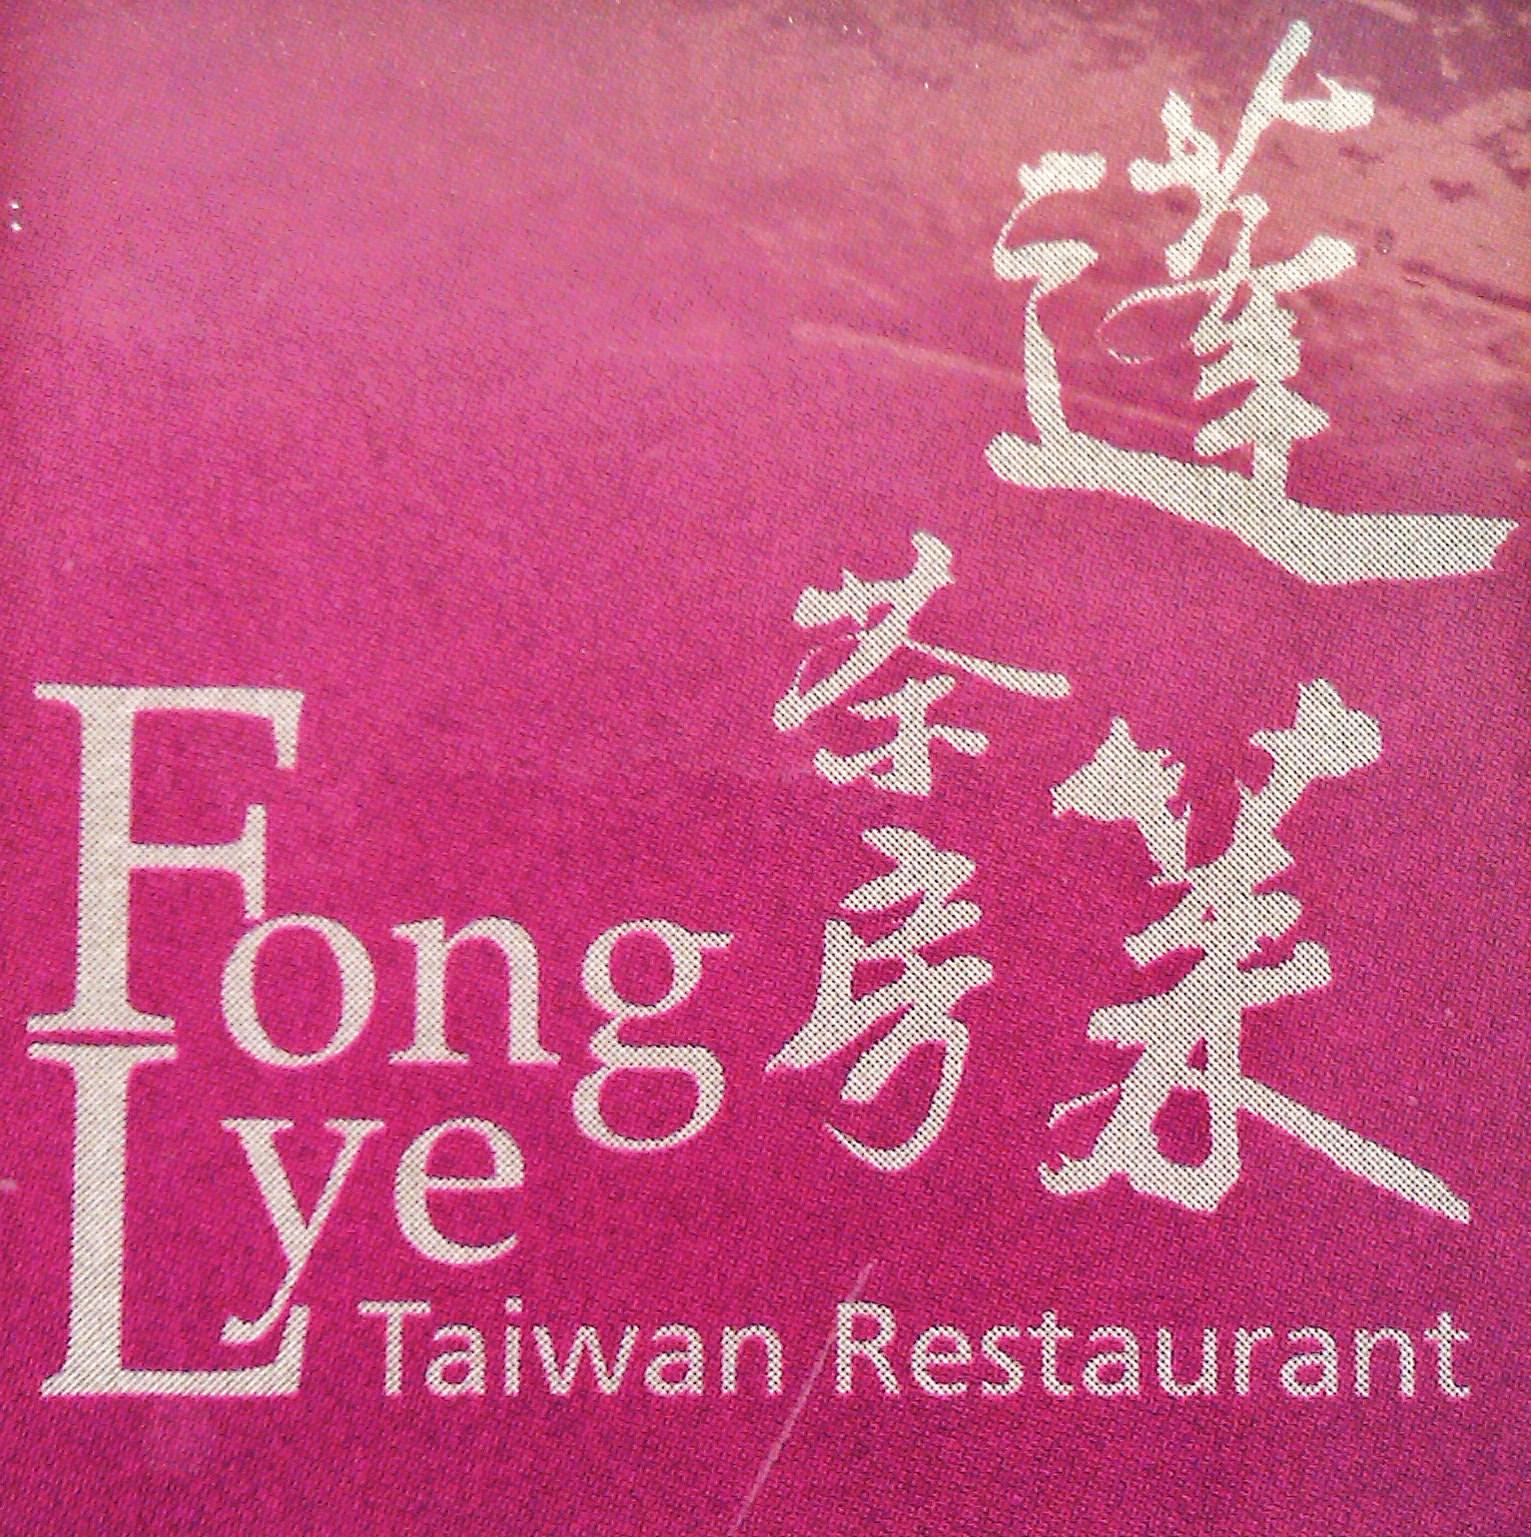 Fong Lye Taiwan Fusion Cuisine Restaurant Sunway Pyramid: Ah Lian Ah Beng: Fong Lye Restaurant @ Sunway Pyramid